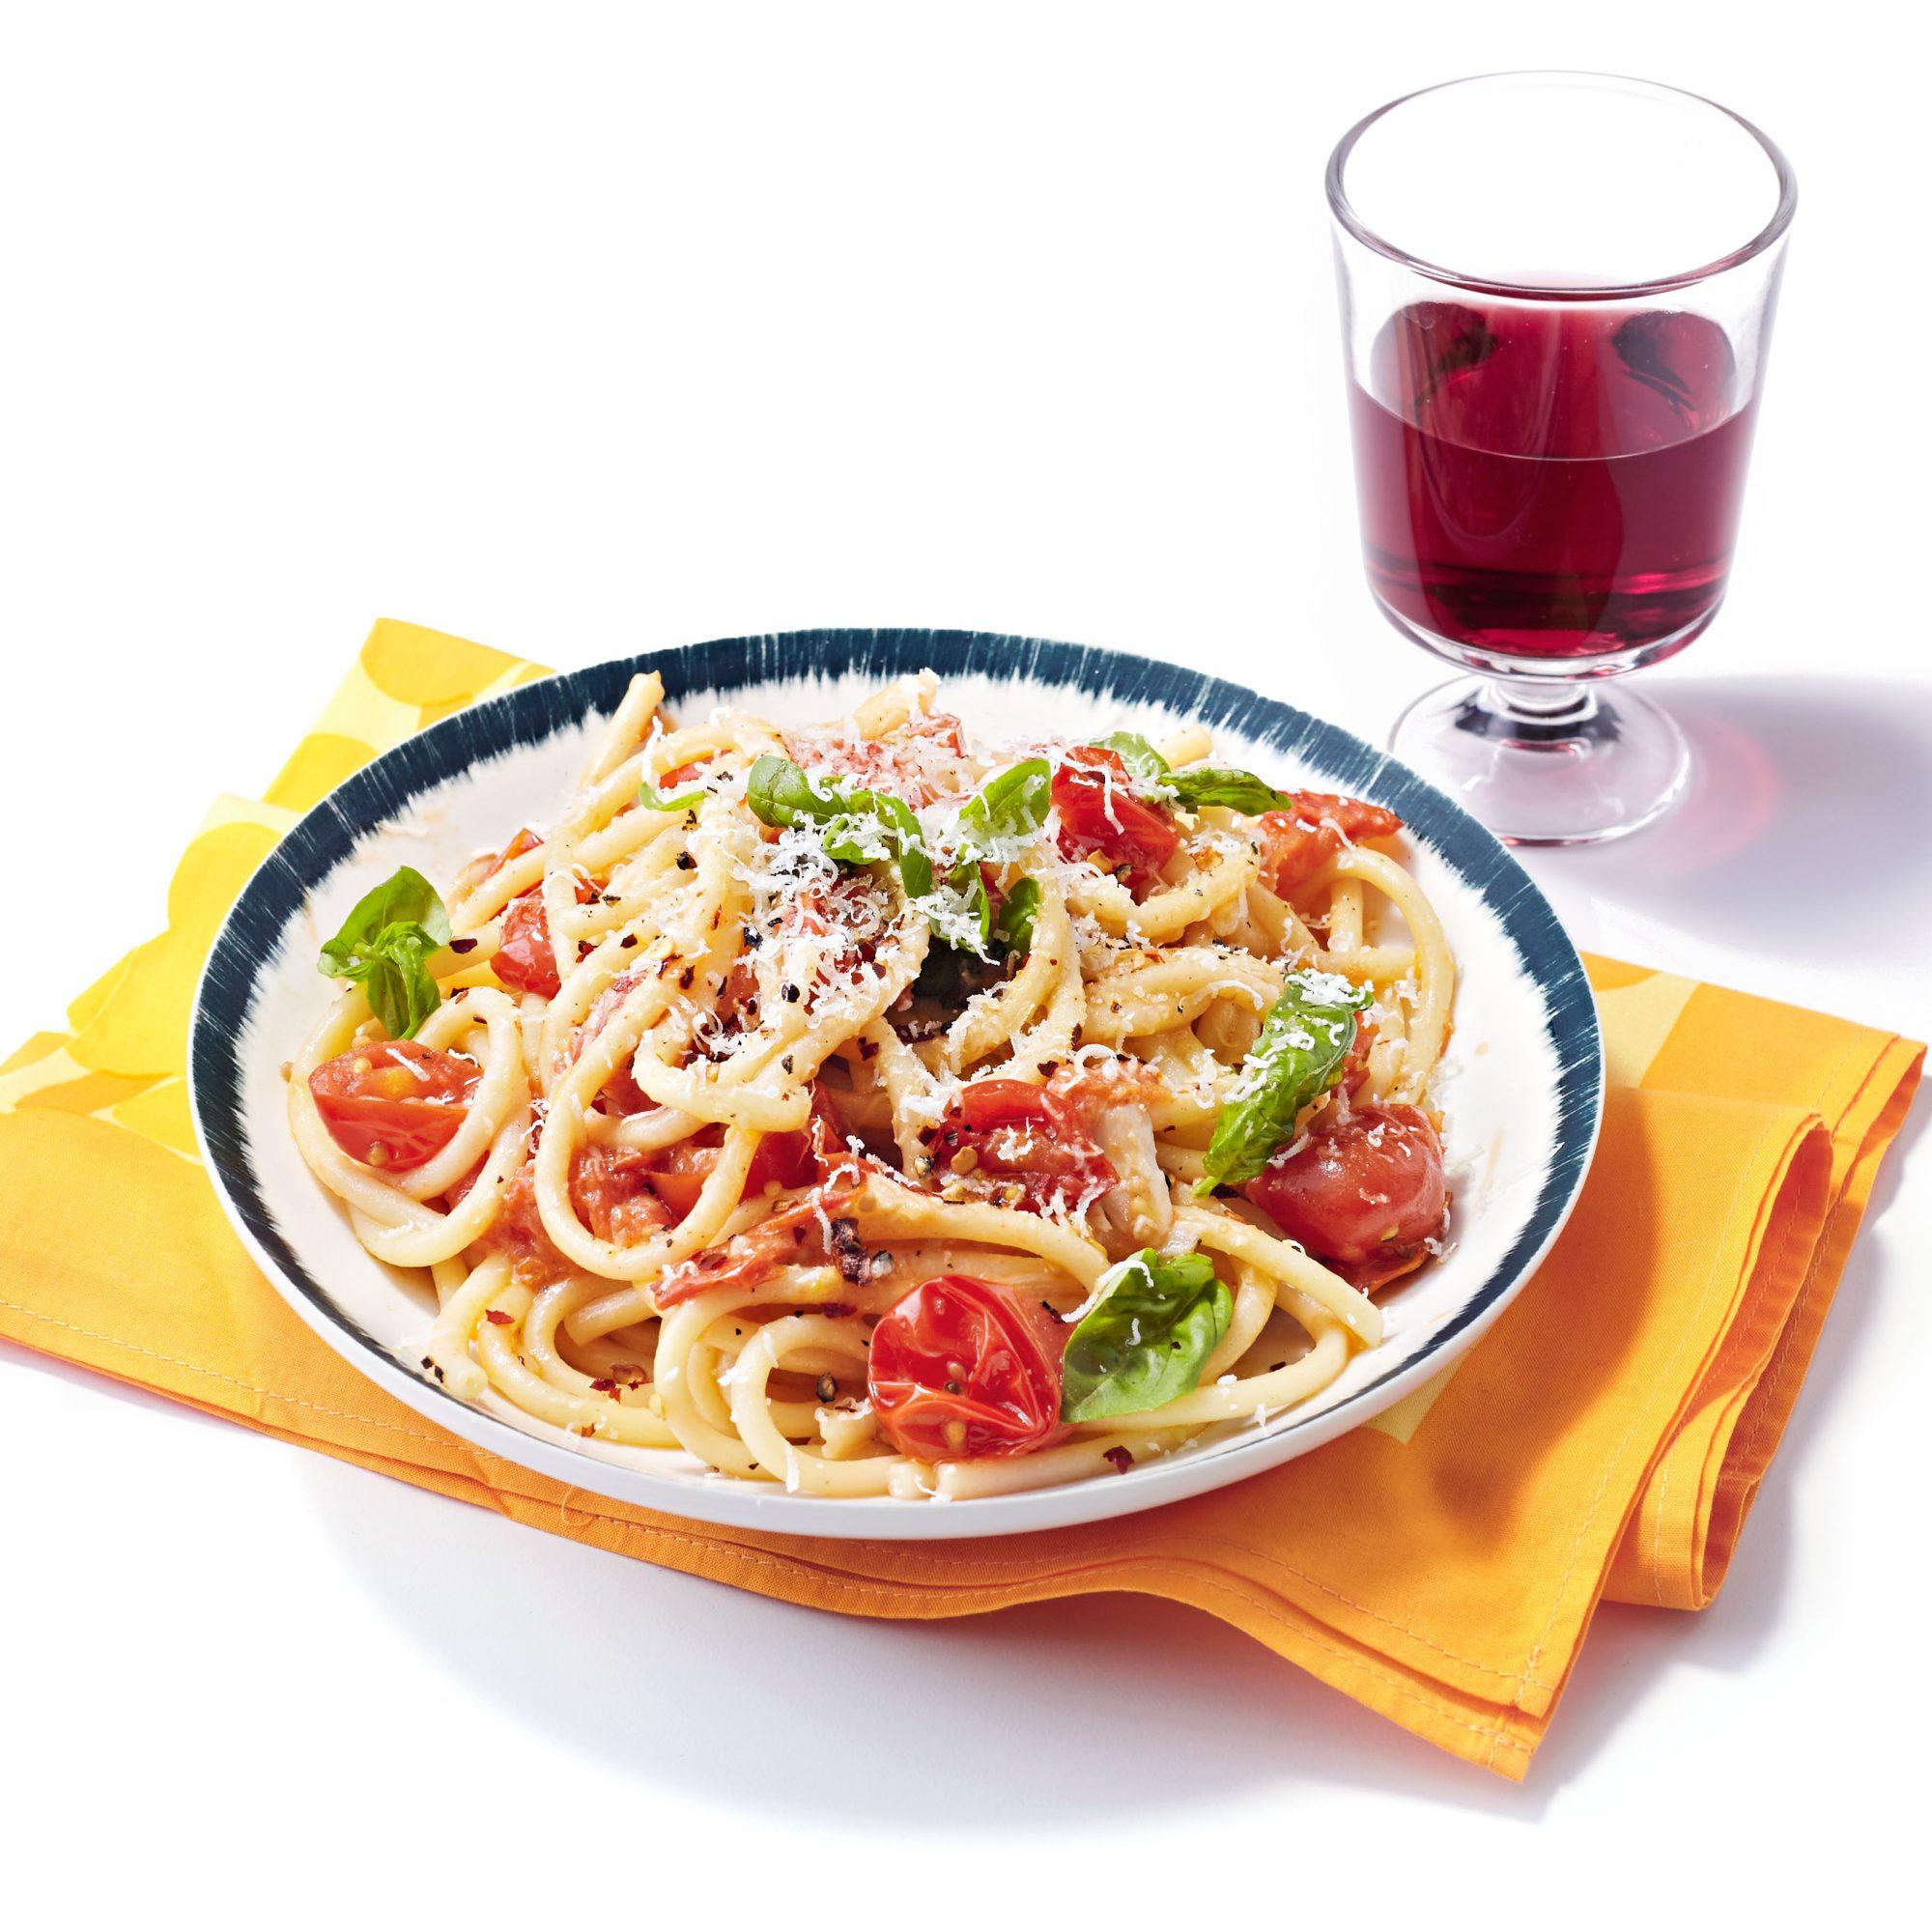 Fat Spaghetti with Garlic, Cherry Tomatoes & Basil